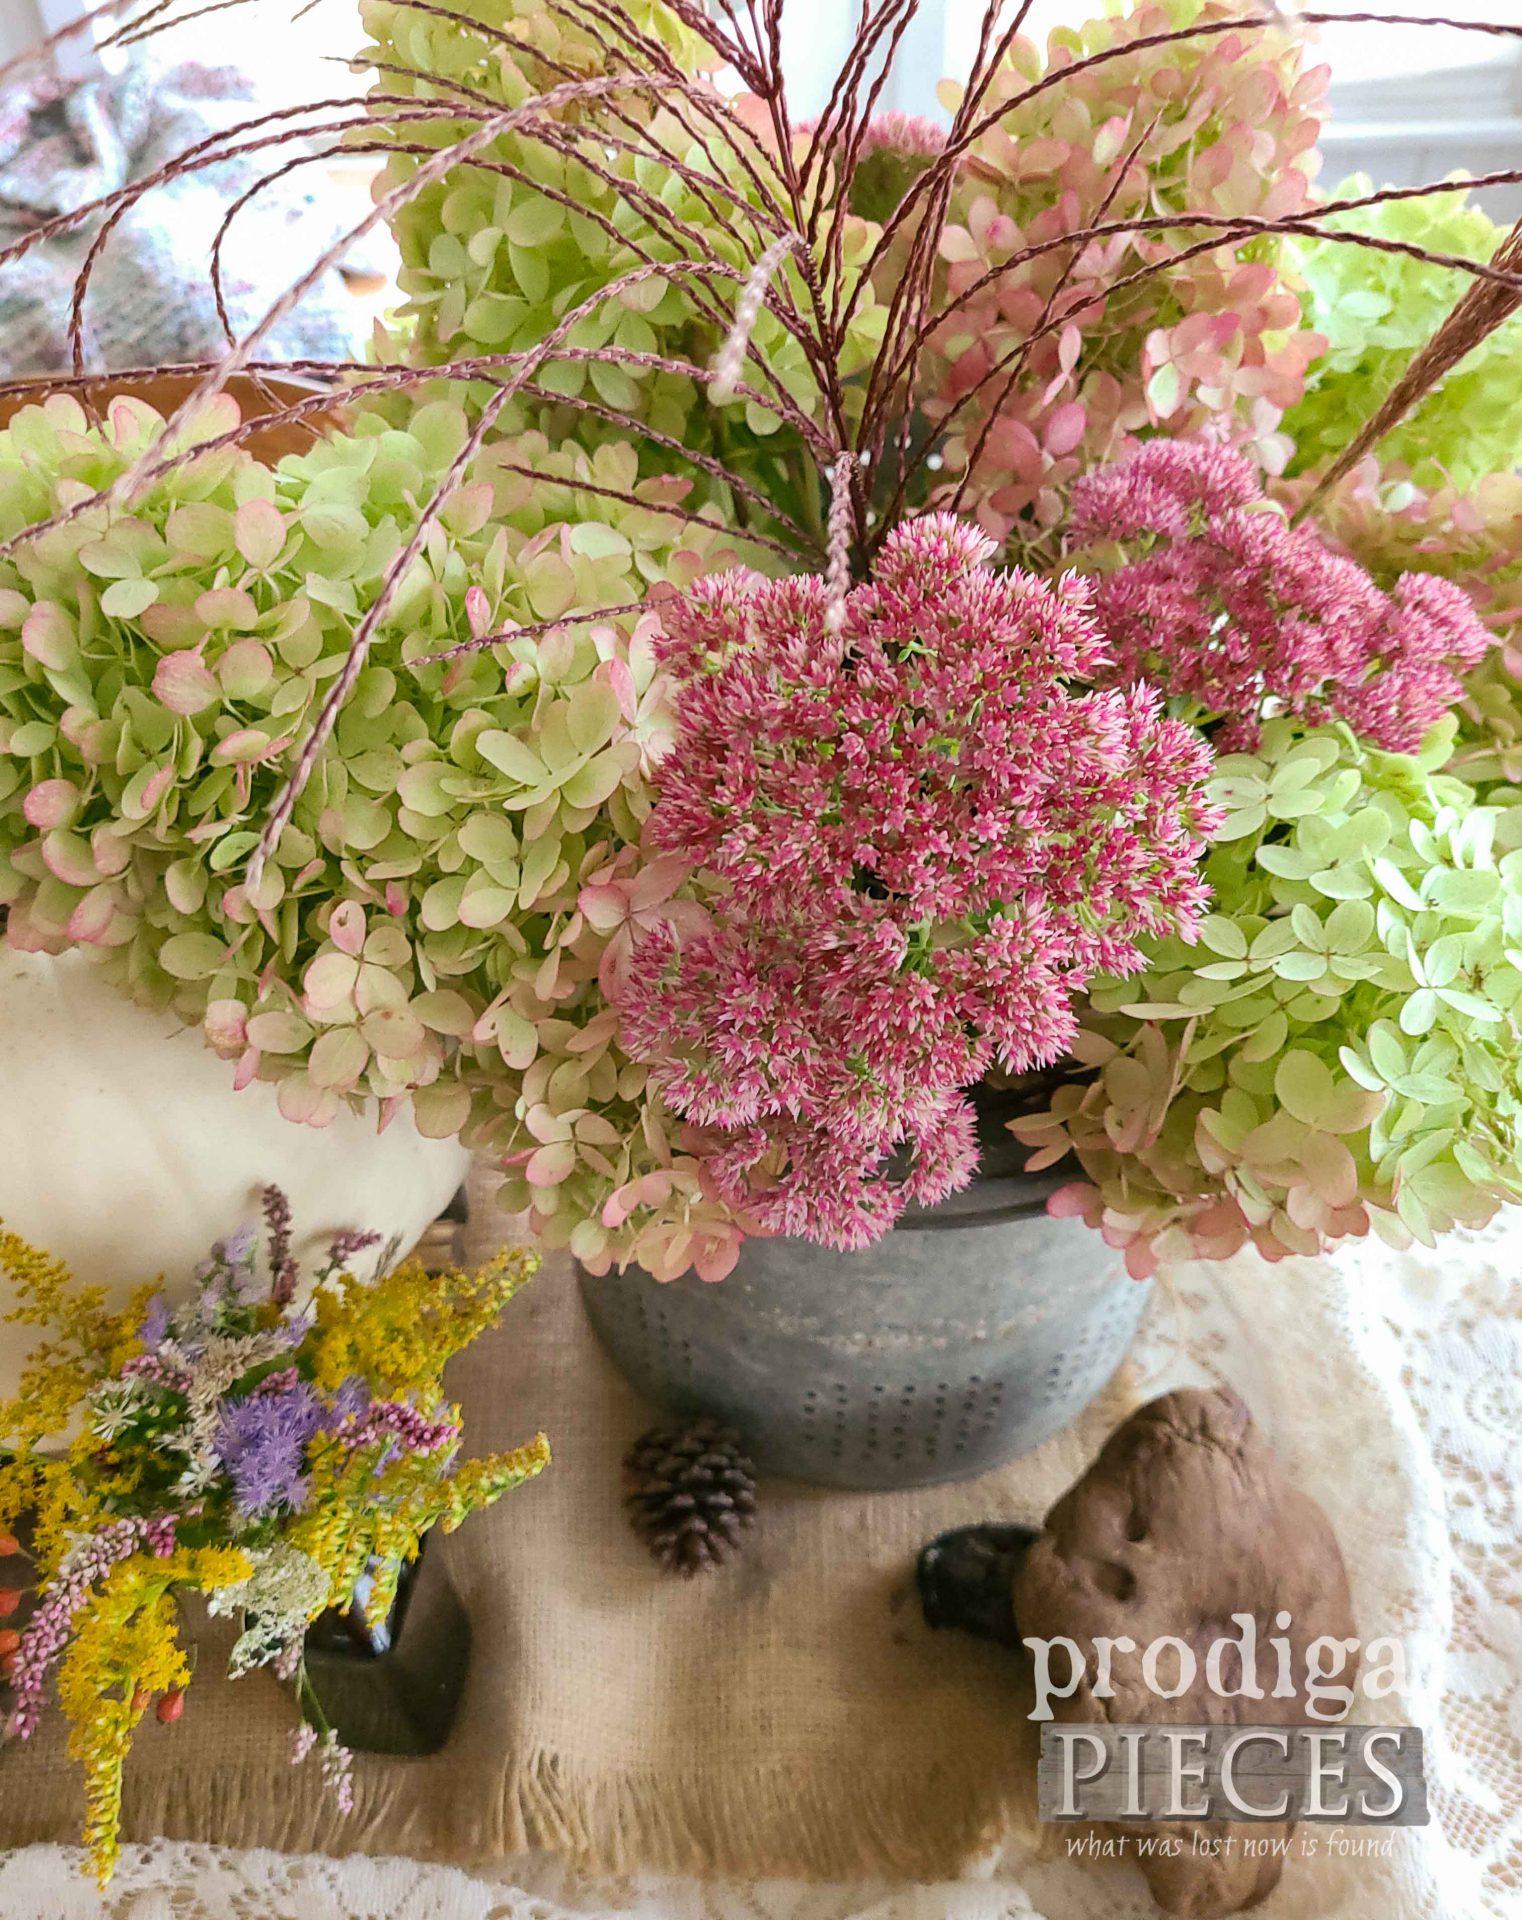 Fall Flower Display in Farmhouse Minnow Bucket by Prodigal Pieces | prodigalpieces.com #prodigalpieces #flowers #farmhouse #fall